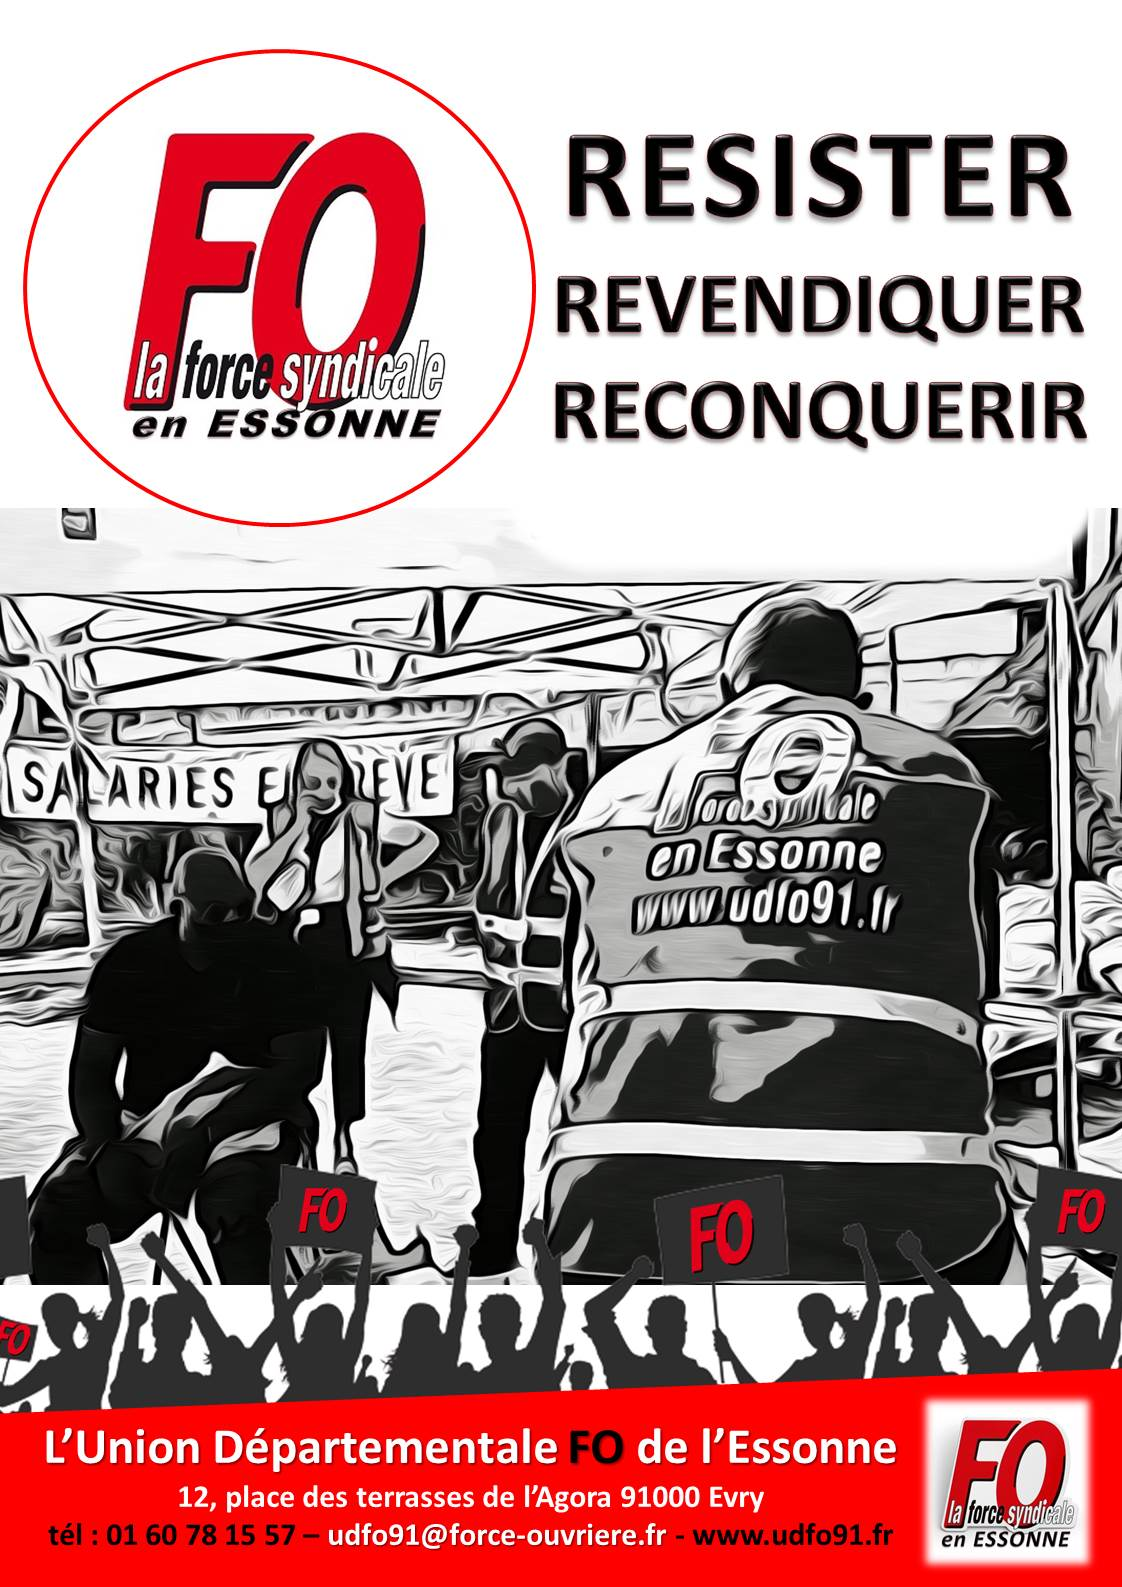 Image of RESISTER REVENDIQUER RECONQUERIR